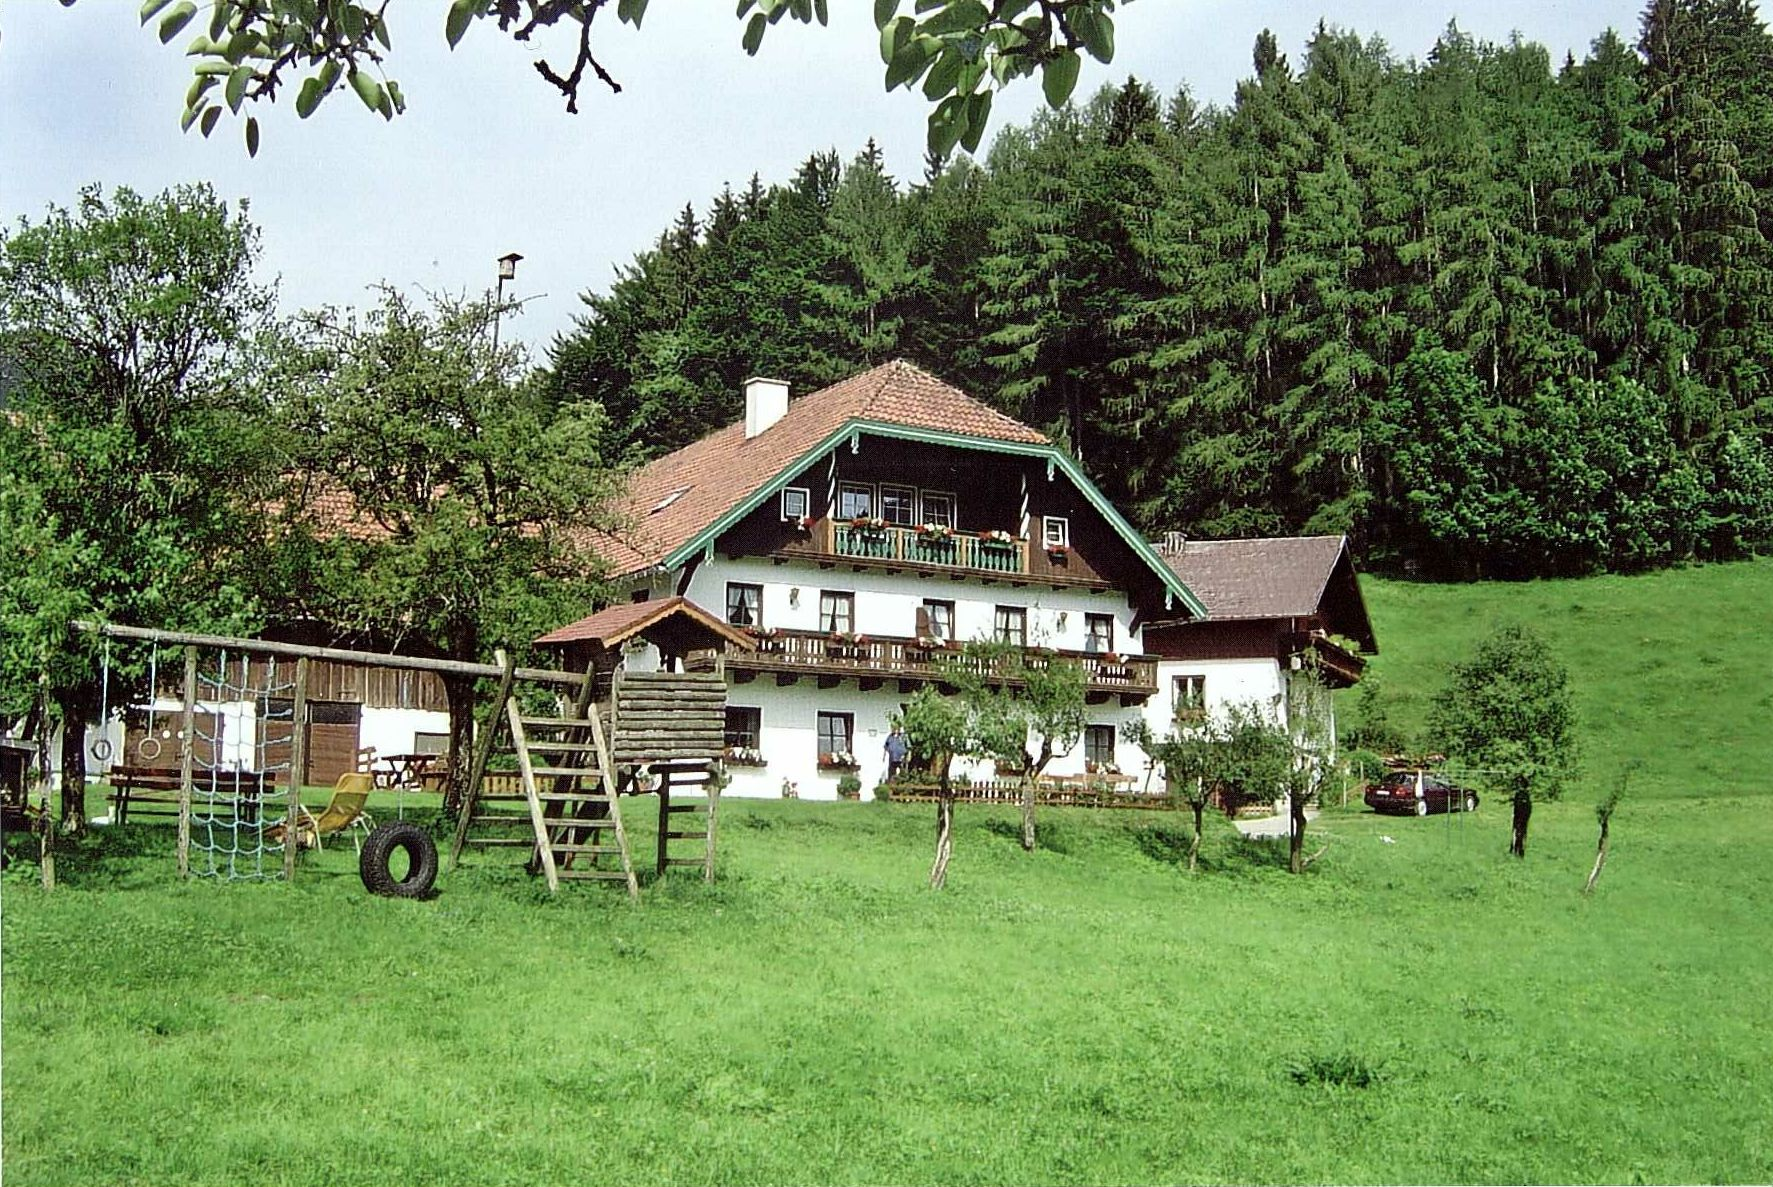 Las granjas del tirol viatges alemany - Parador de la granja fotos ...